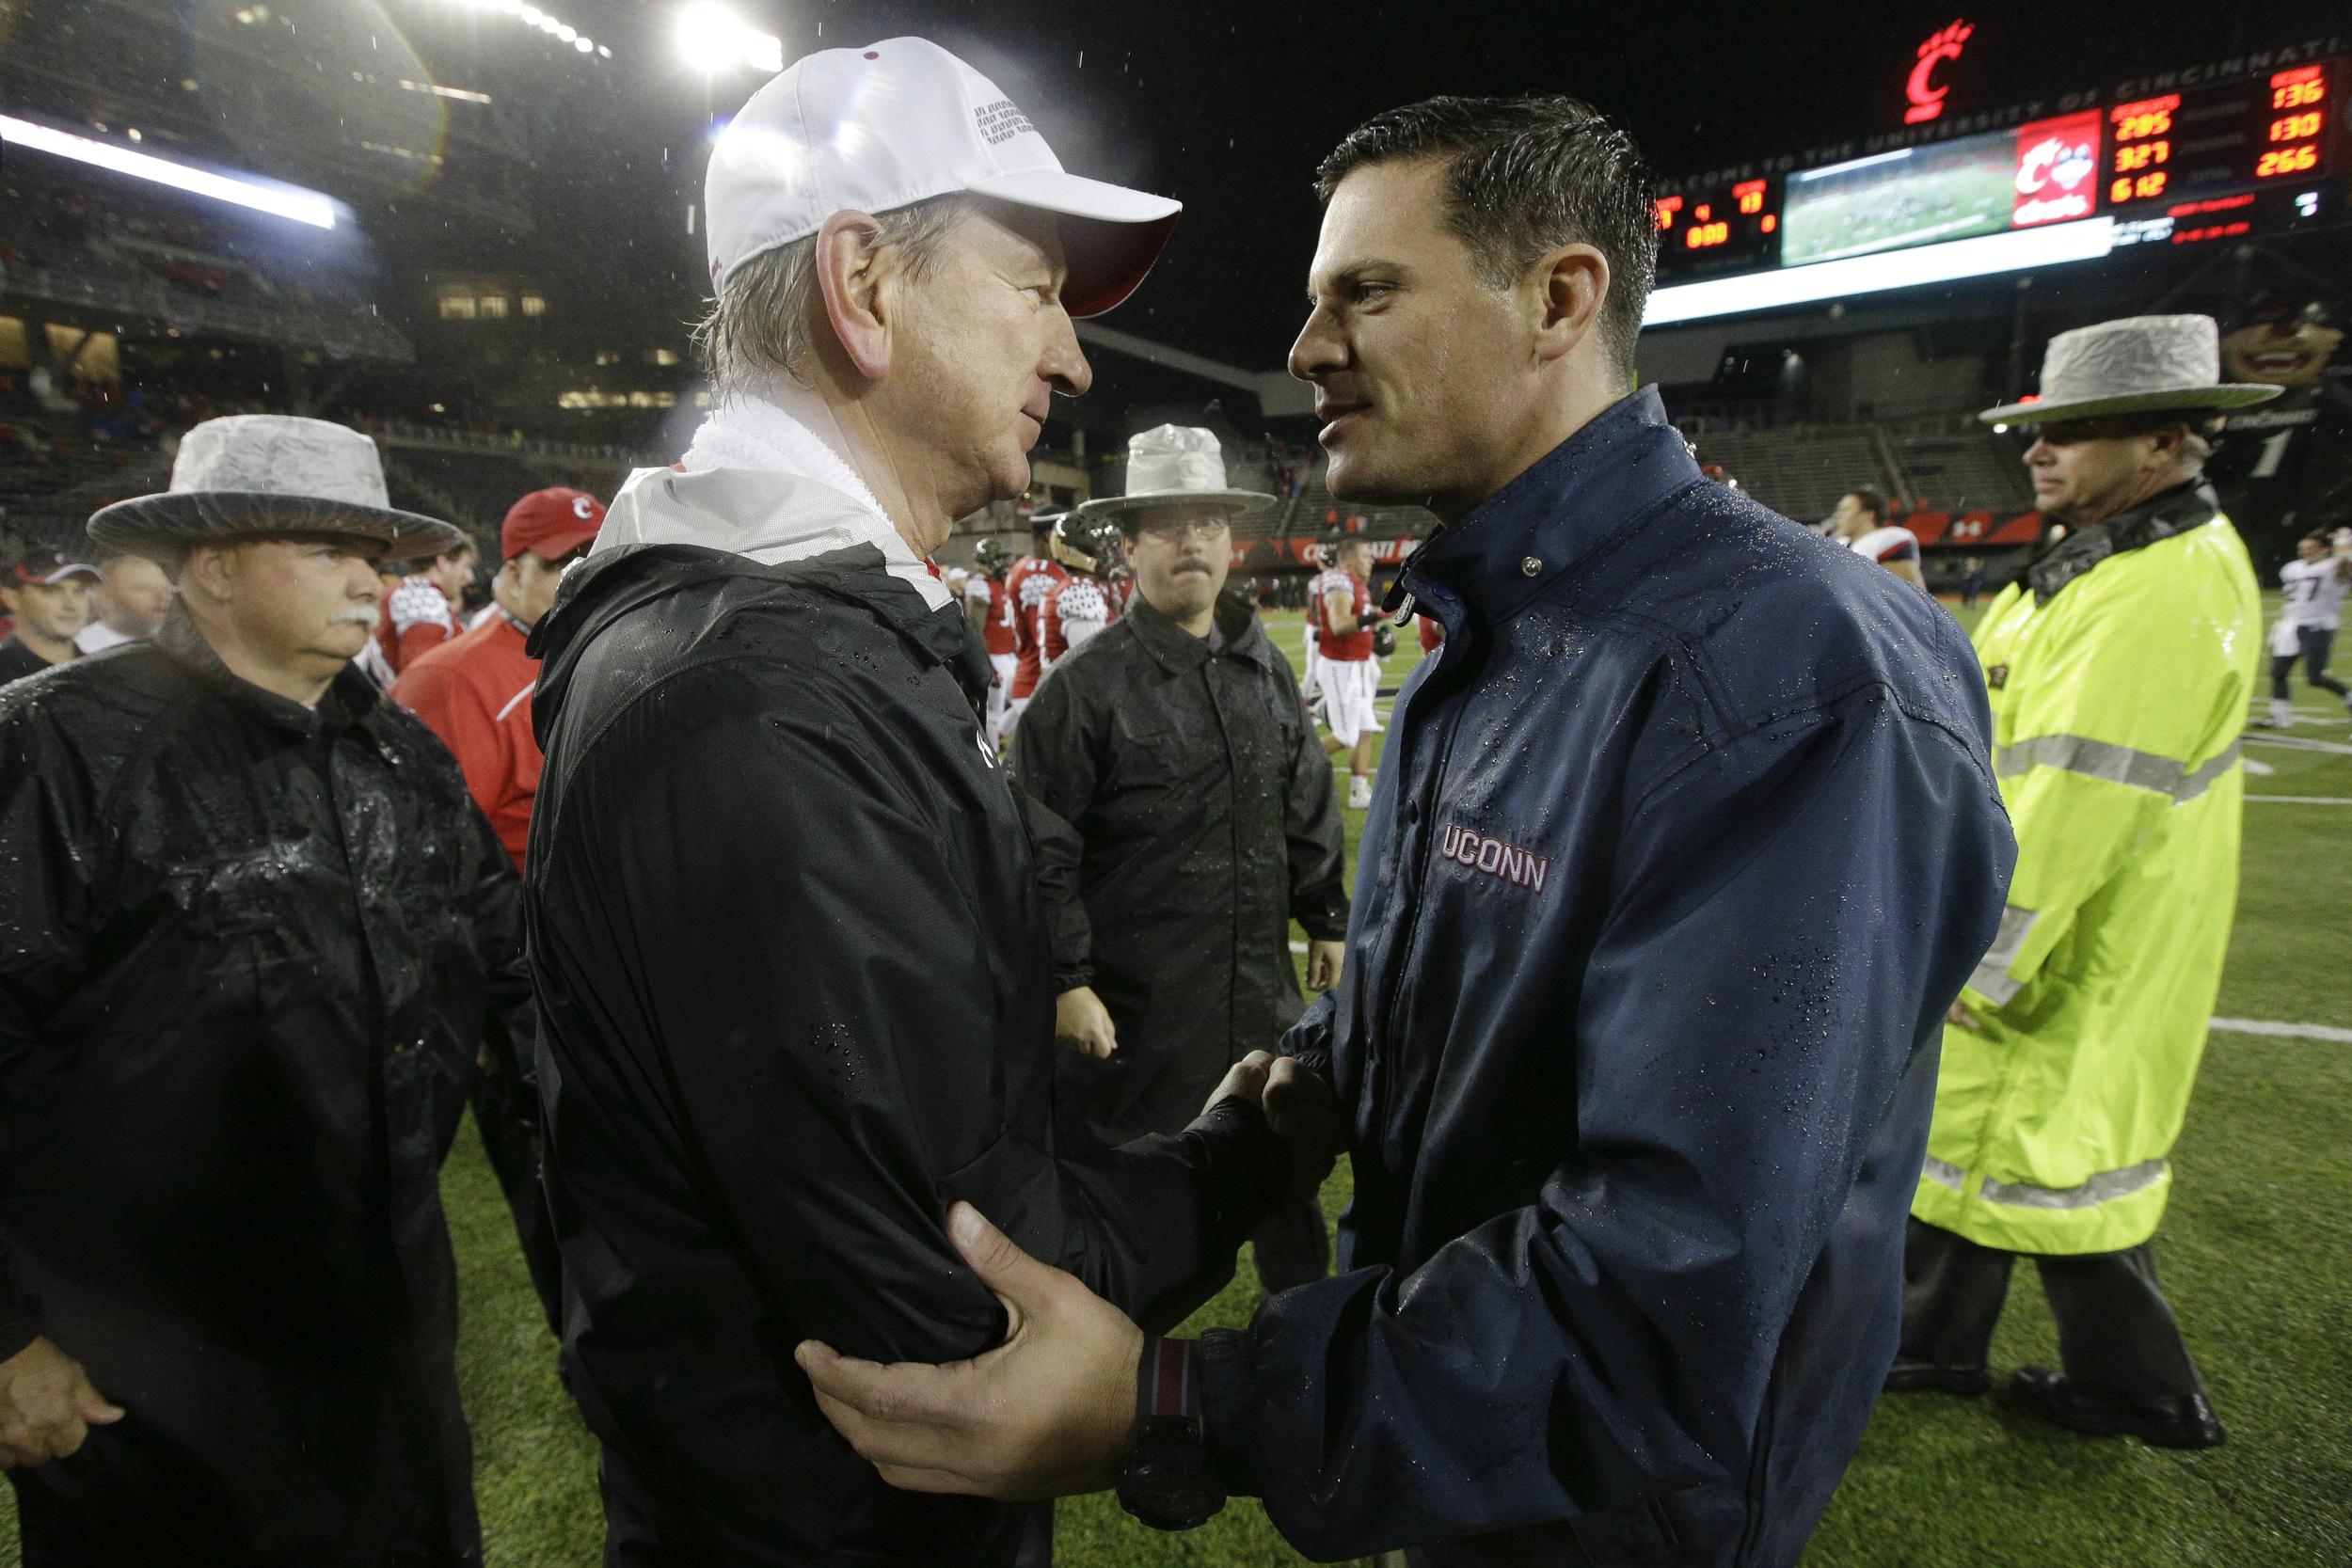 Cincinnati head coach Tommy Tuberville, left, shakes hands with Connecticut head coach Bob Diaco after an NCAA college football game, Saturday, Oct. 24, 2015, in Cincinnati. Cincinnati won 37-13. (John Minchillo/AP)